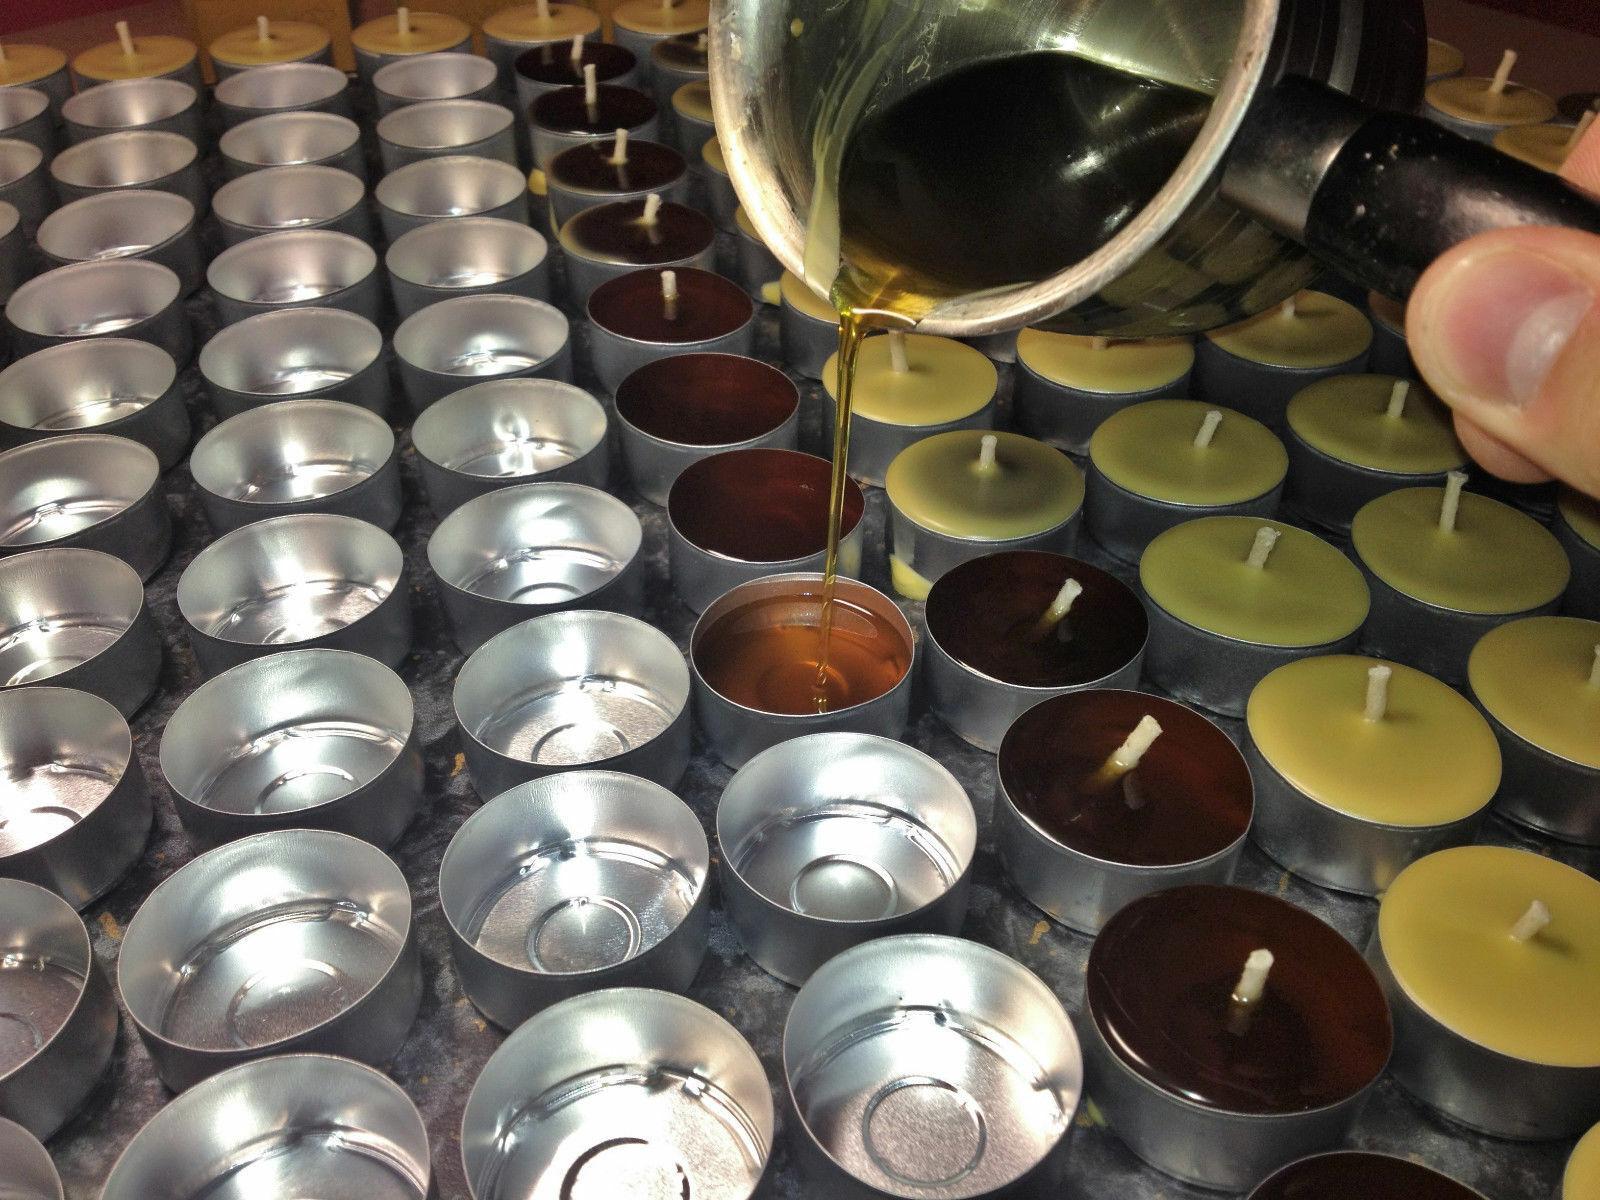 PROMOTION    200 pcs HANDMADE 100% BEESWAX TEA LIGHTS